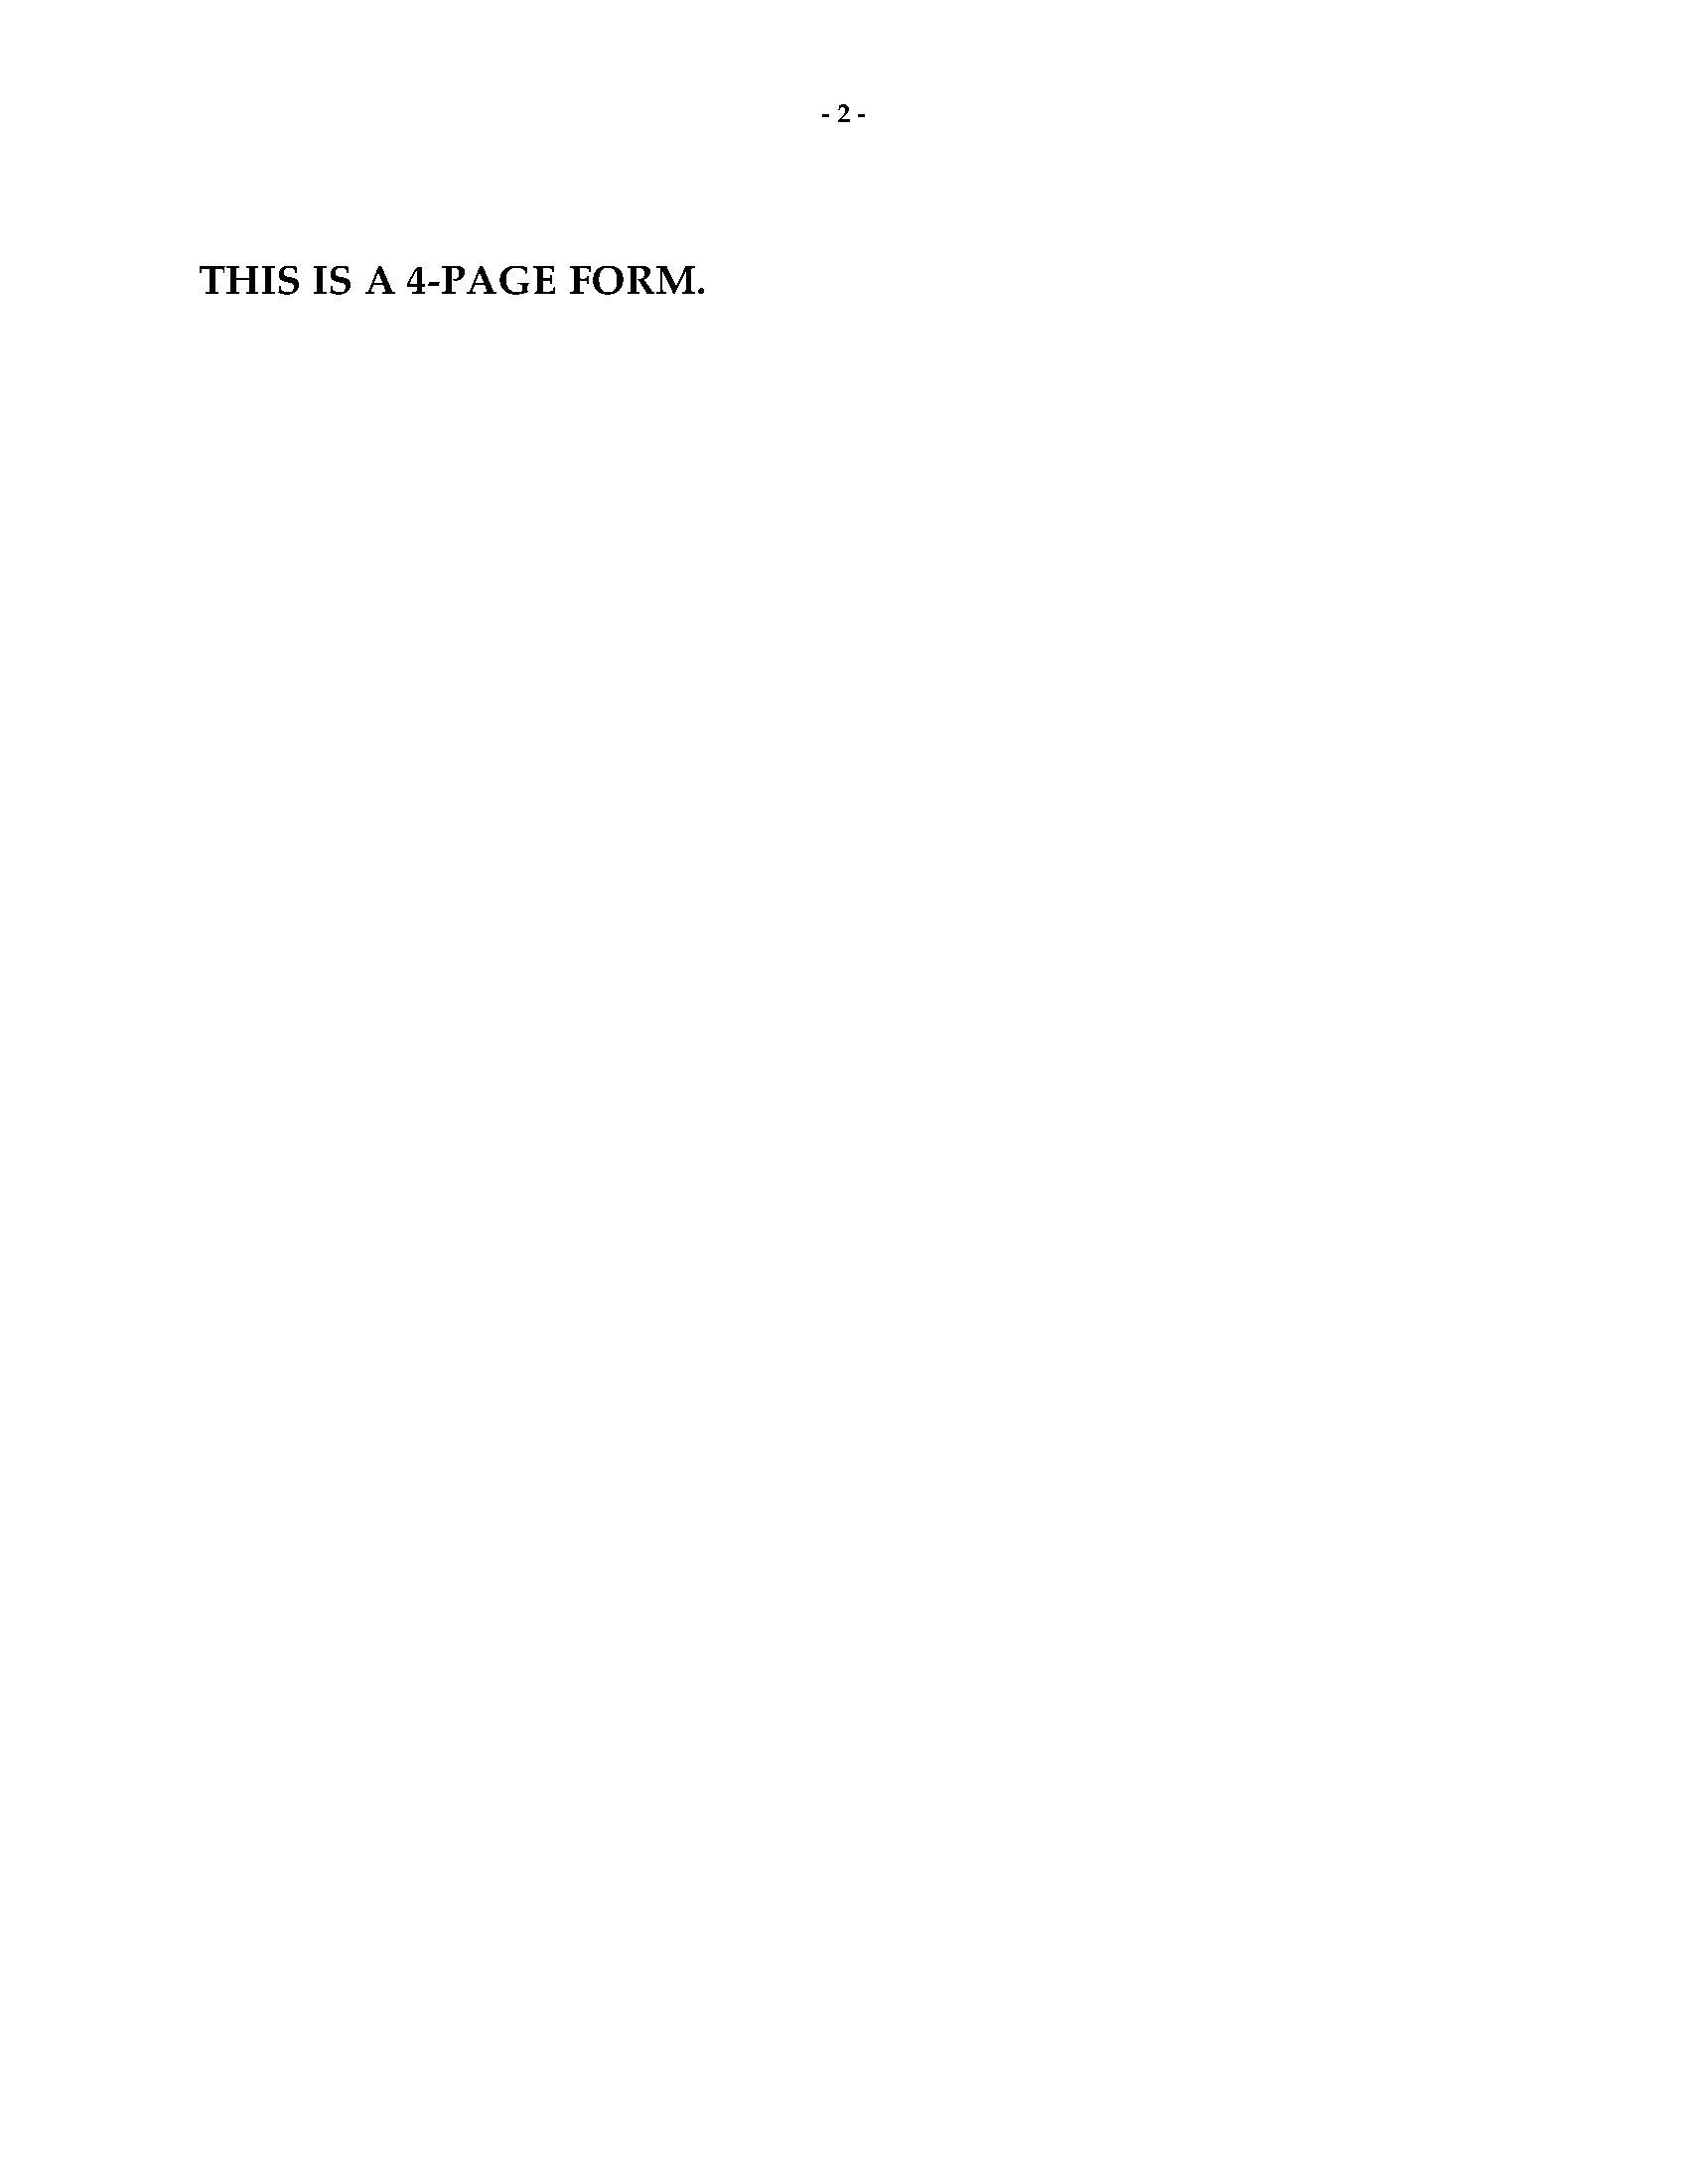 an effective essay writing service uk